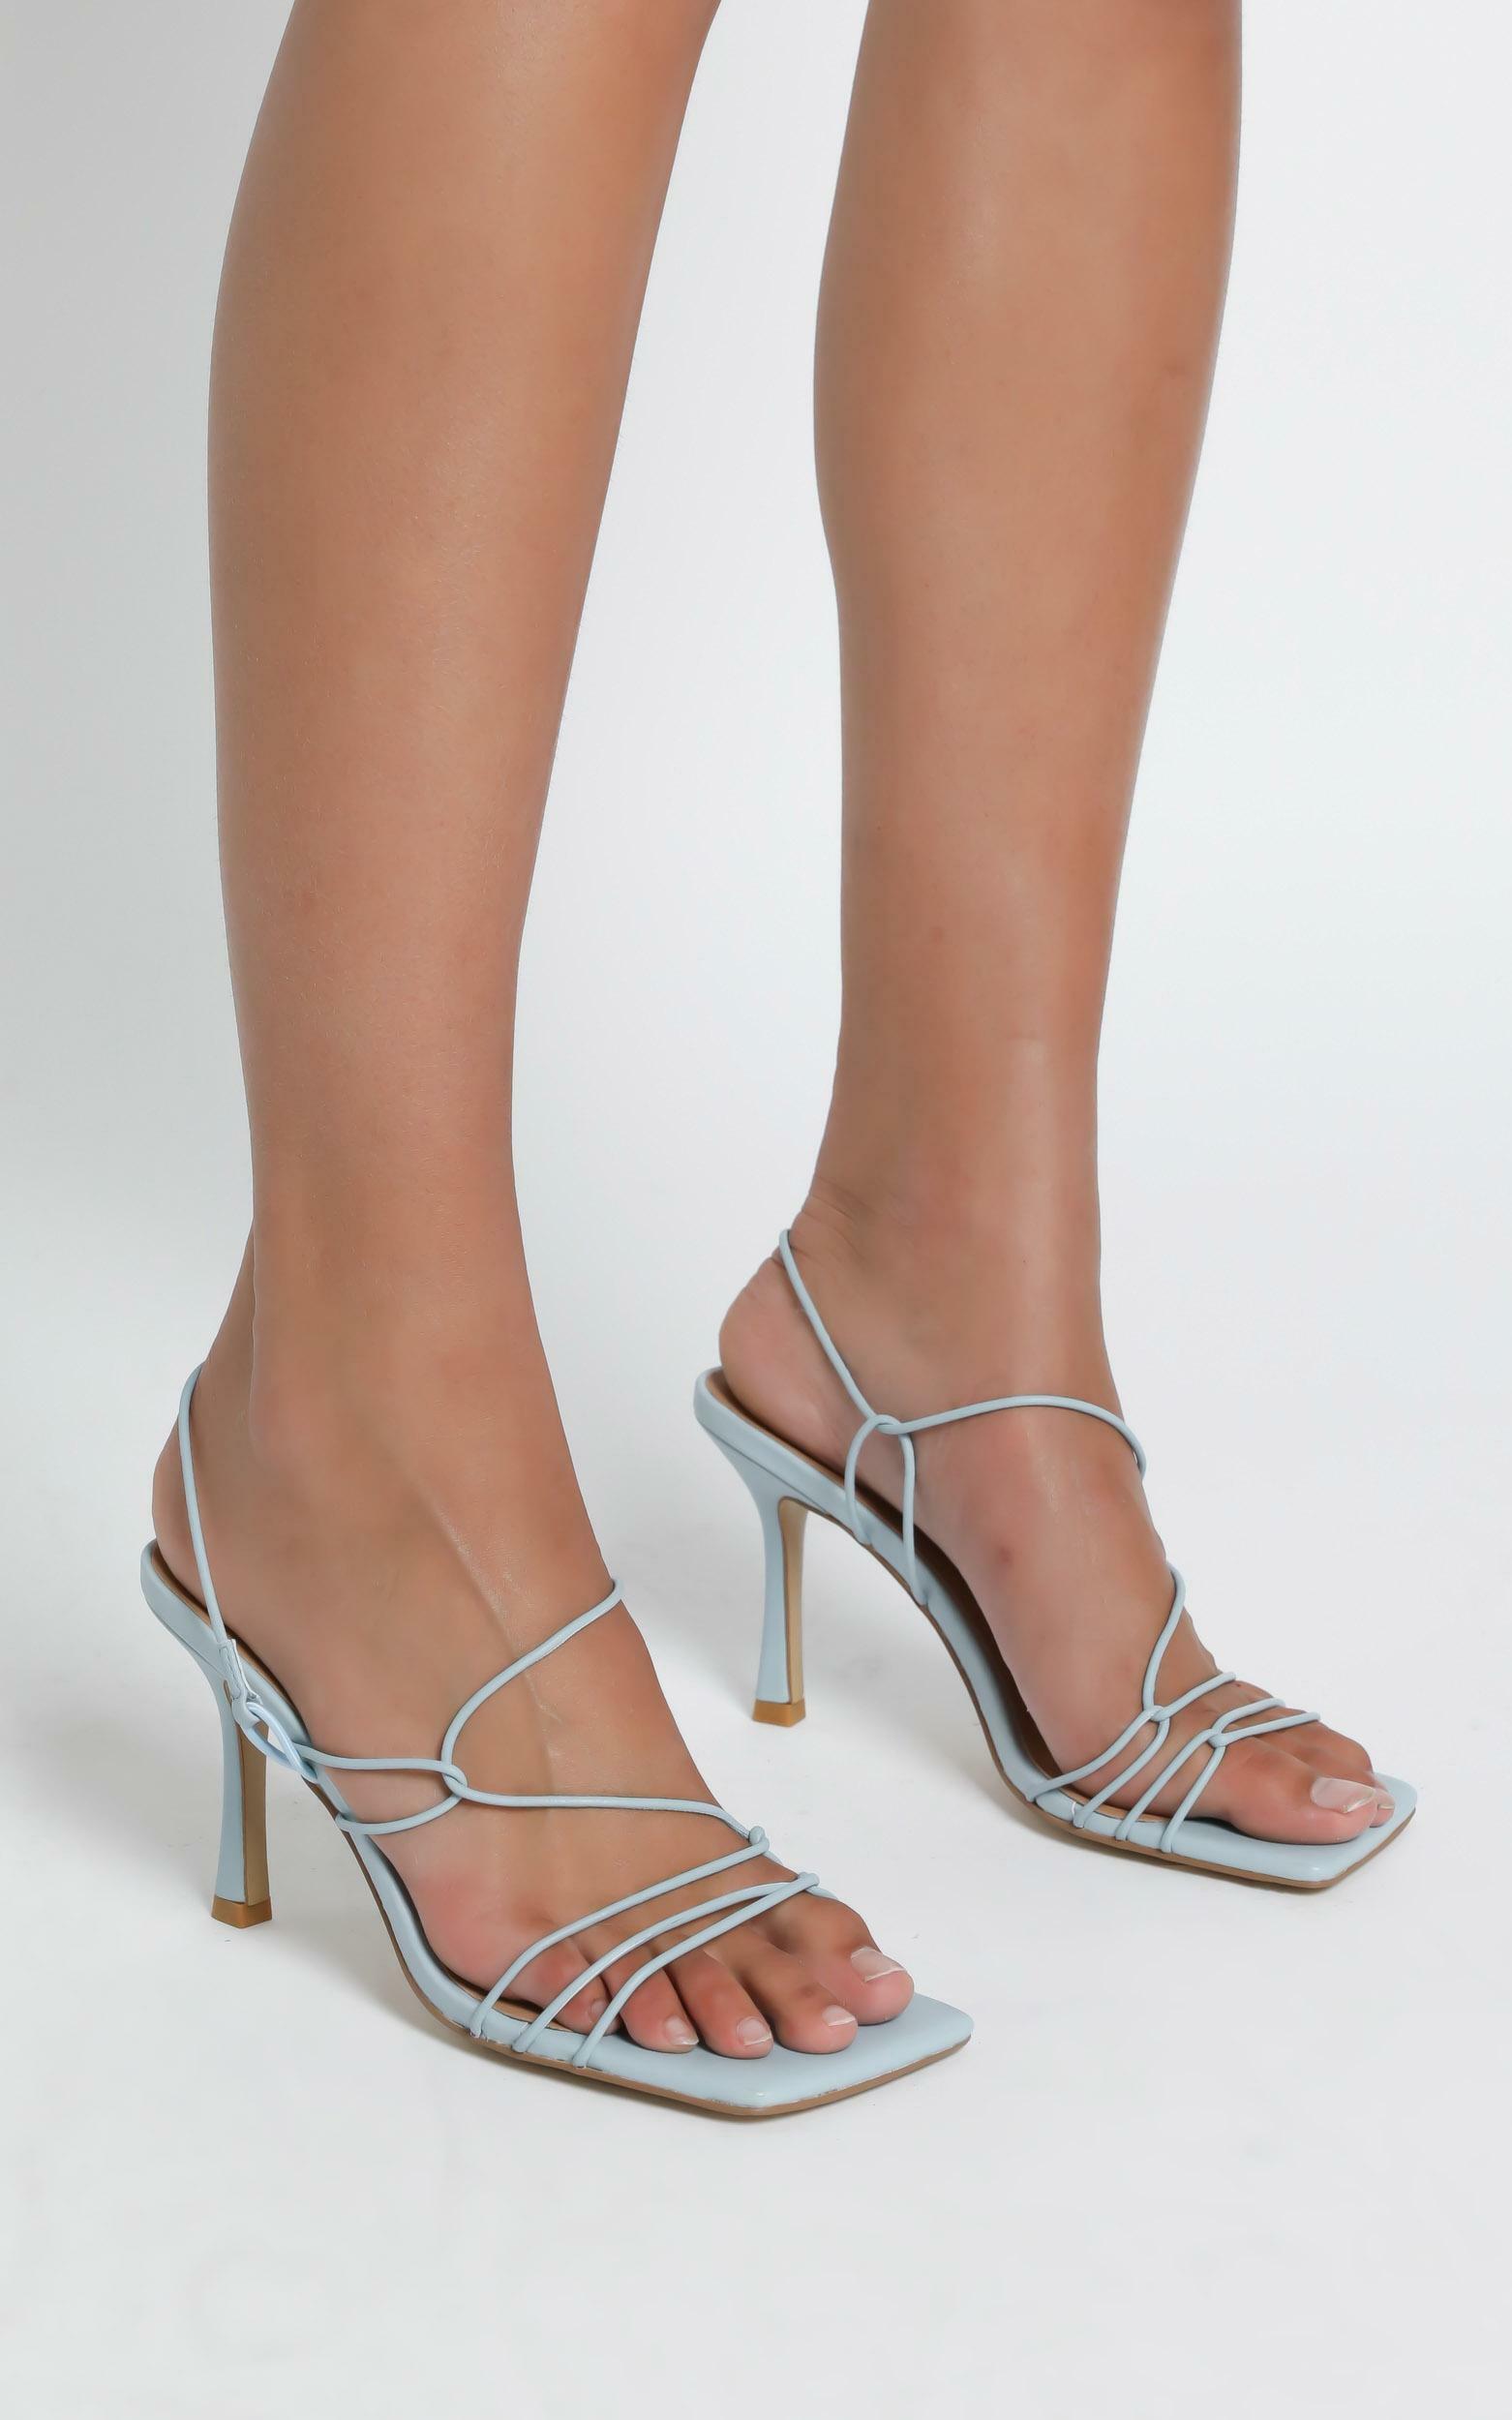 Alias Mae - Leyla Heel in Pale Blue Leather - 5.5, BLU18, hi-res image number null